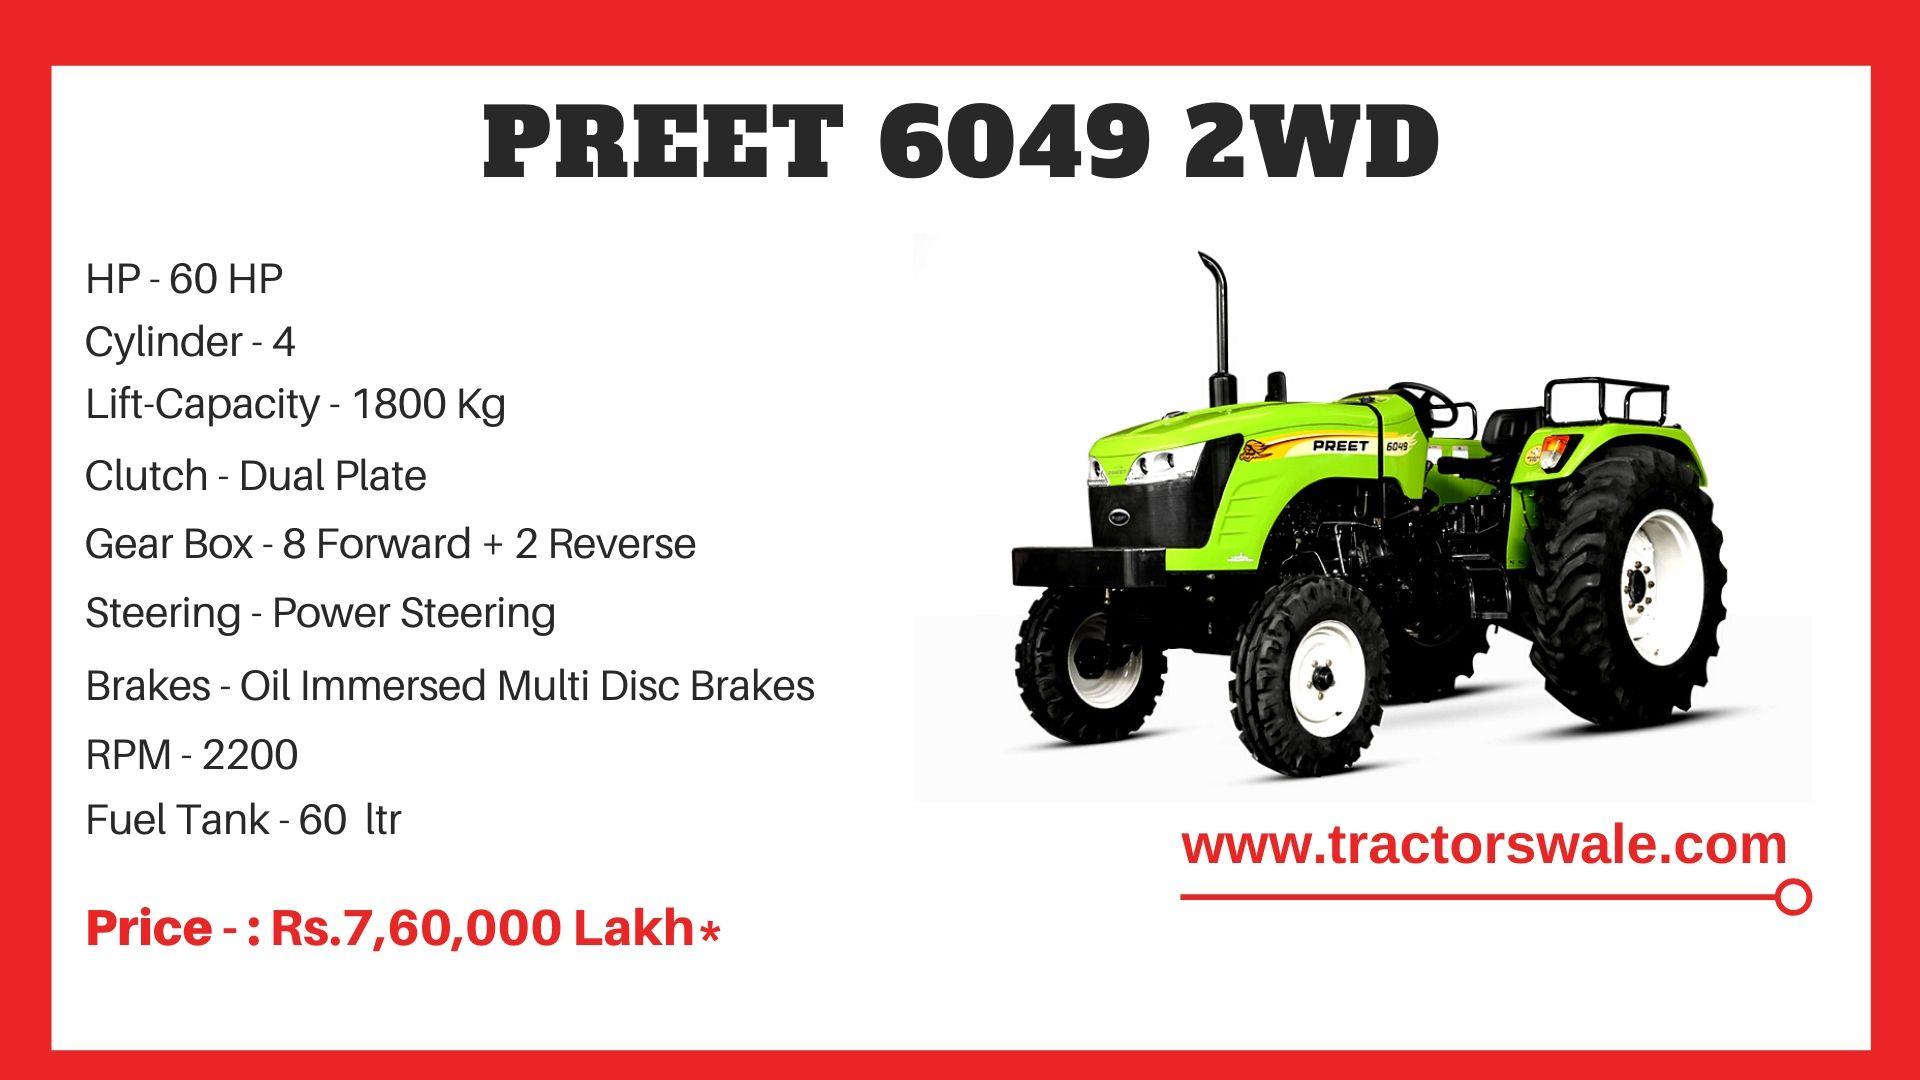 Preet 6049 tractor price